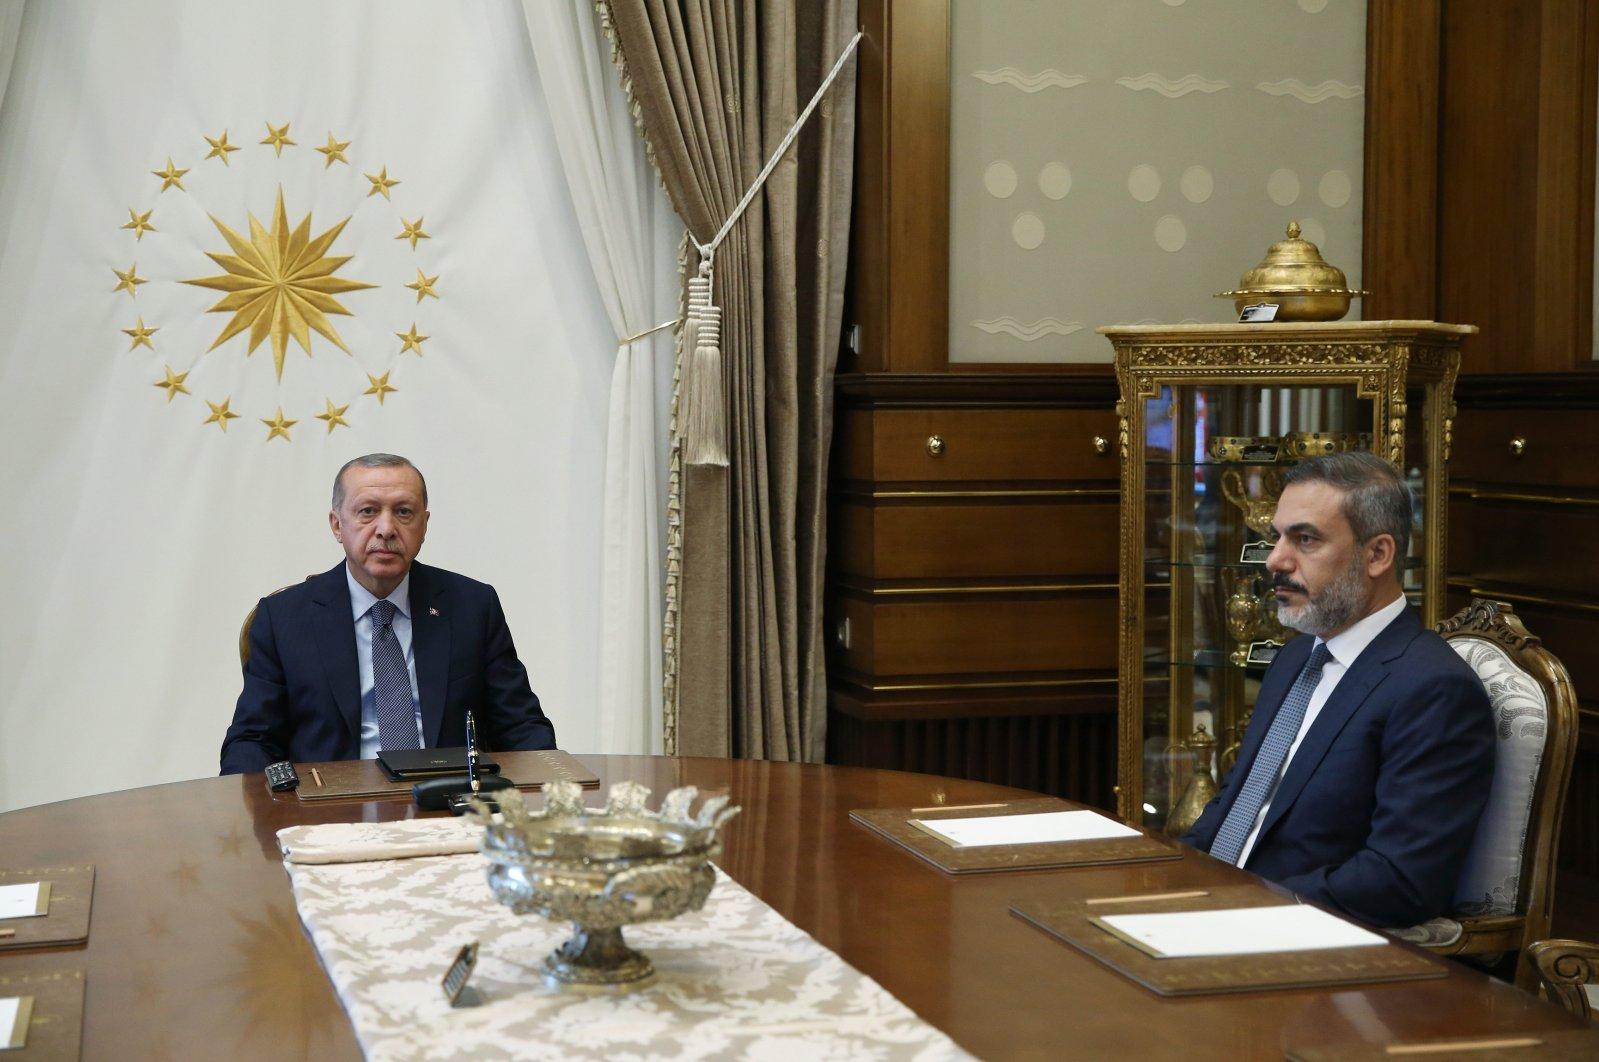 President Recep Tayyip Erdoğan (L) receives National Intelligence Organization (MIT) chief Hakan Fidan at the Presidential Complex in the capital Ankara on Aug. 10, 2018. (DHA File Photo)